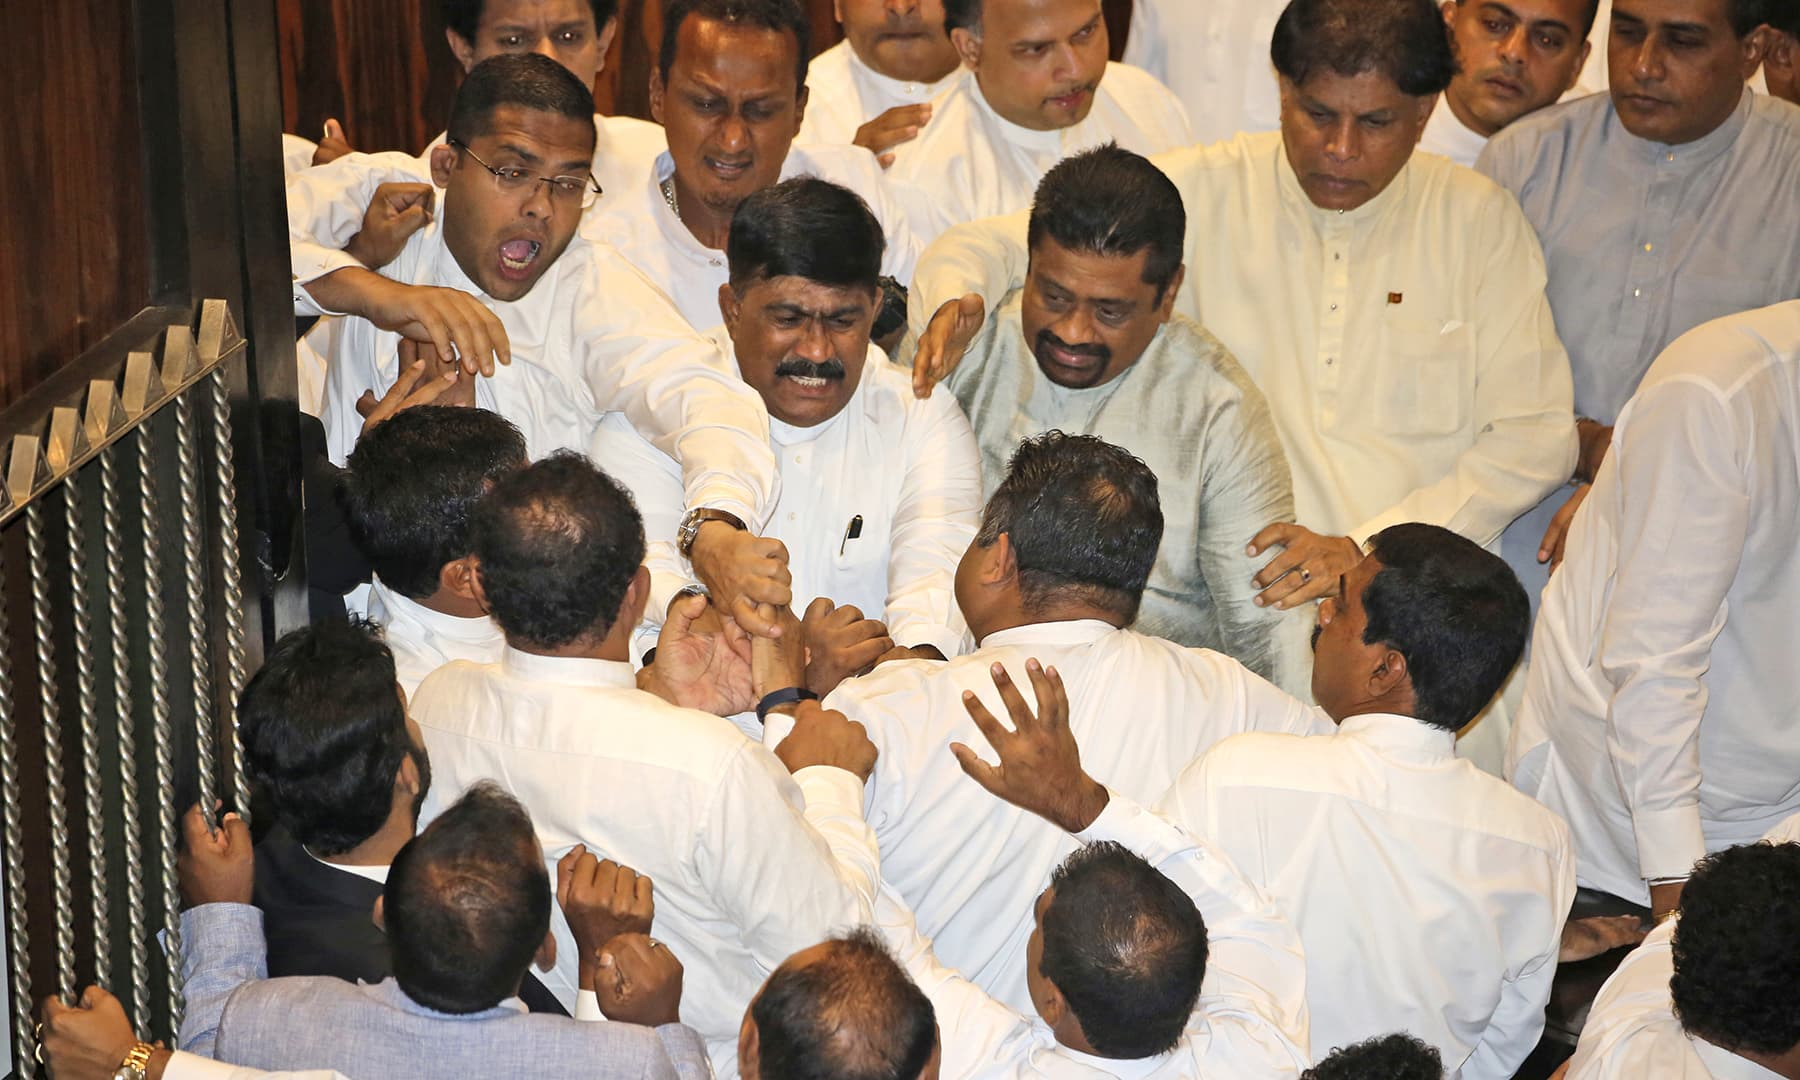 Sri Lankan Lawmakers fight in the parliament chamber in Colombo, Sri Lanka, Thursday, November 15, 2018. —AP